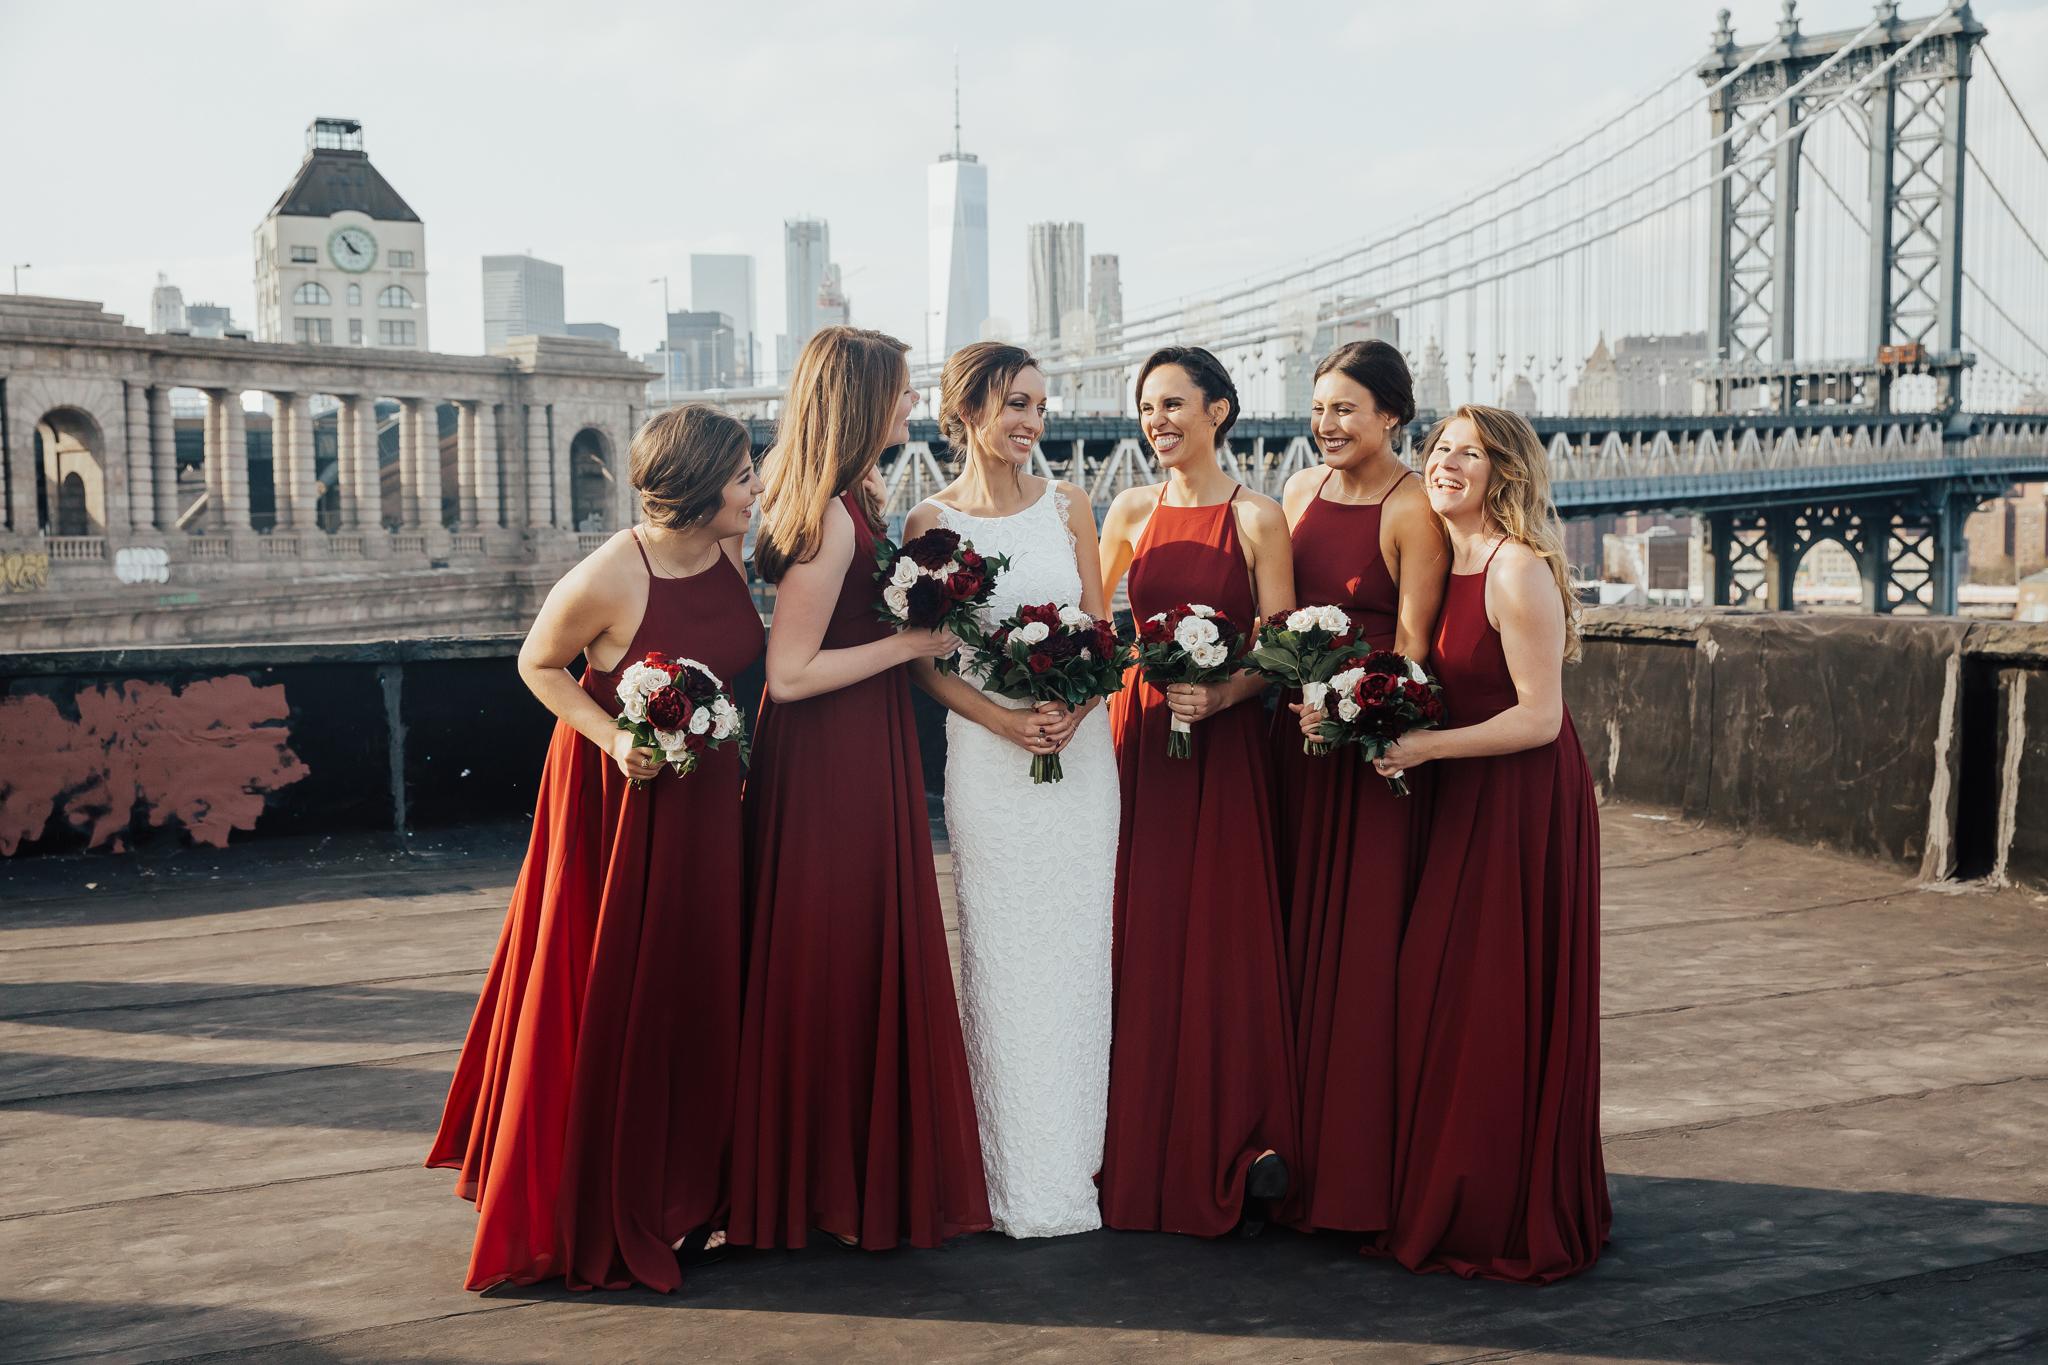 26-bridge-wedding-brooklyn-026.JPG